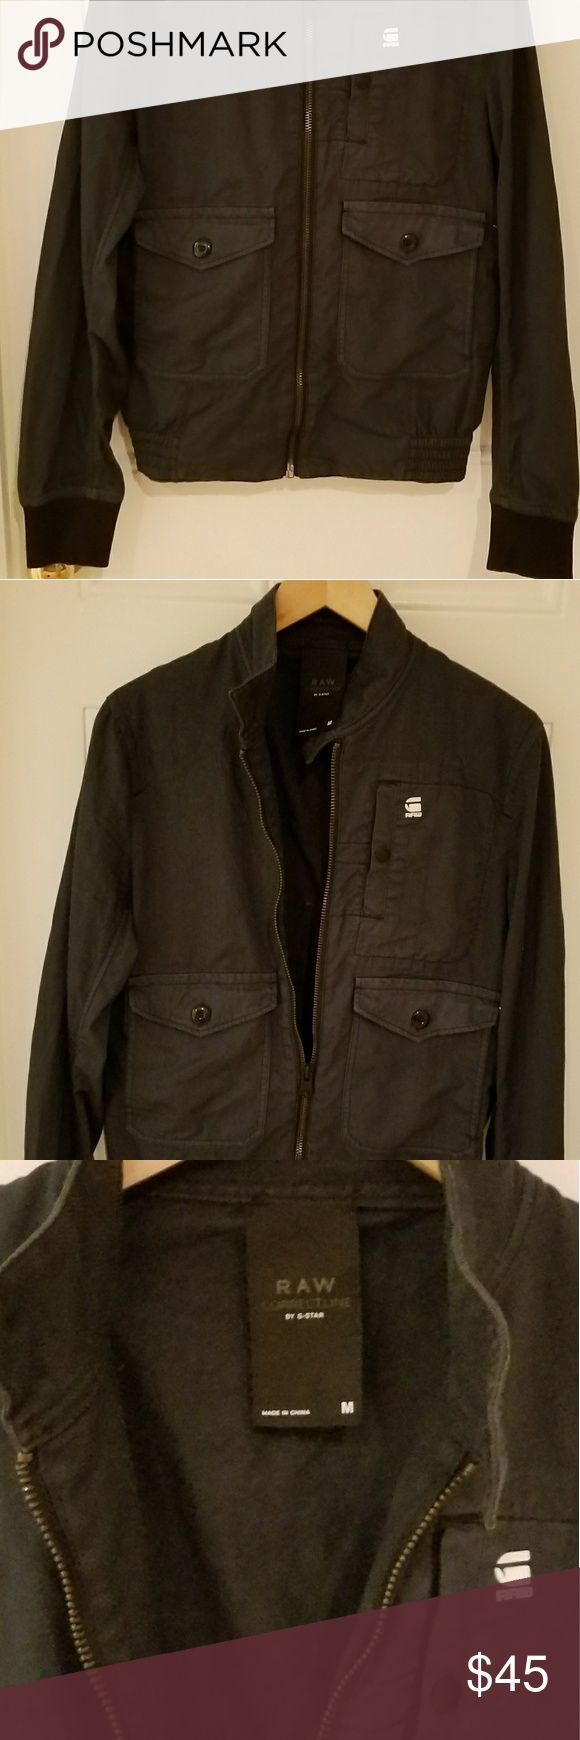 G STAR RAW DENIM Bomber Jacket (M) G STAR RAW Denim Bomber Jacket (Navy Blue) EXCELLENT CONDITION G-Star Jackets & Coats Bomber & Varsity